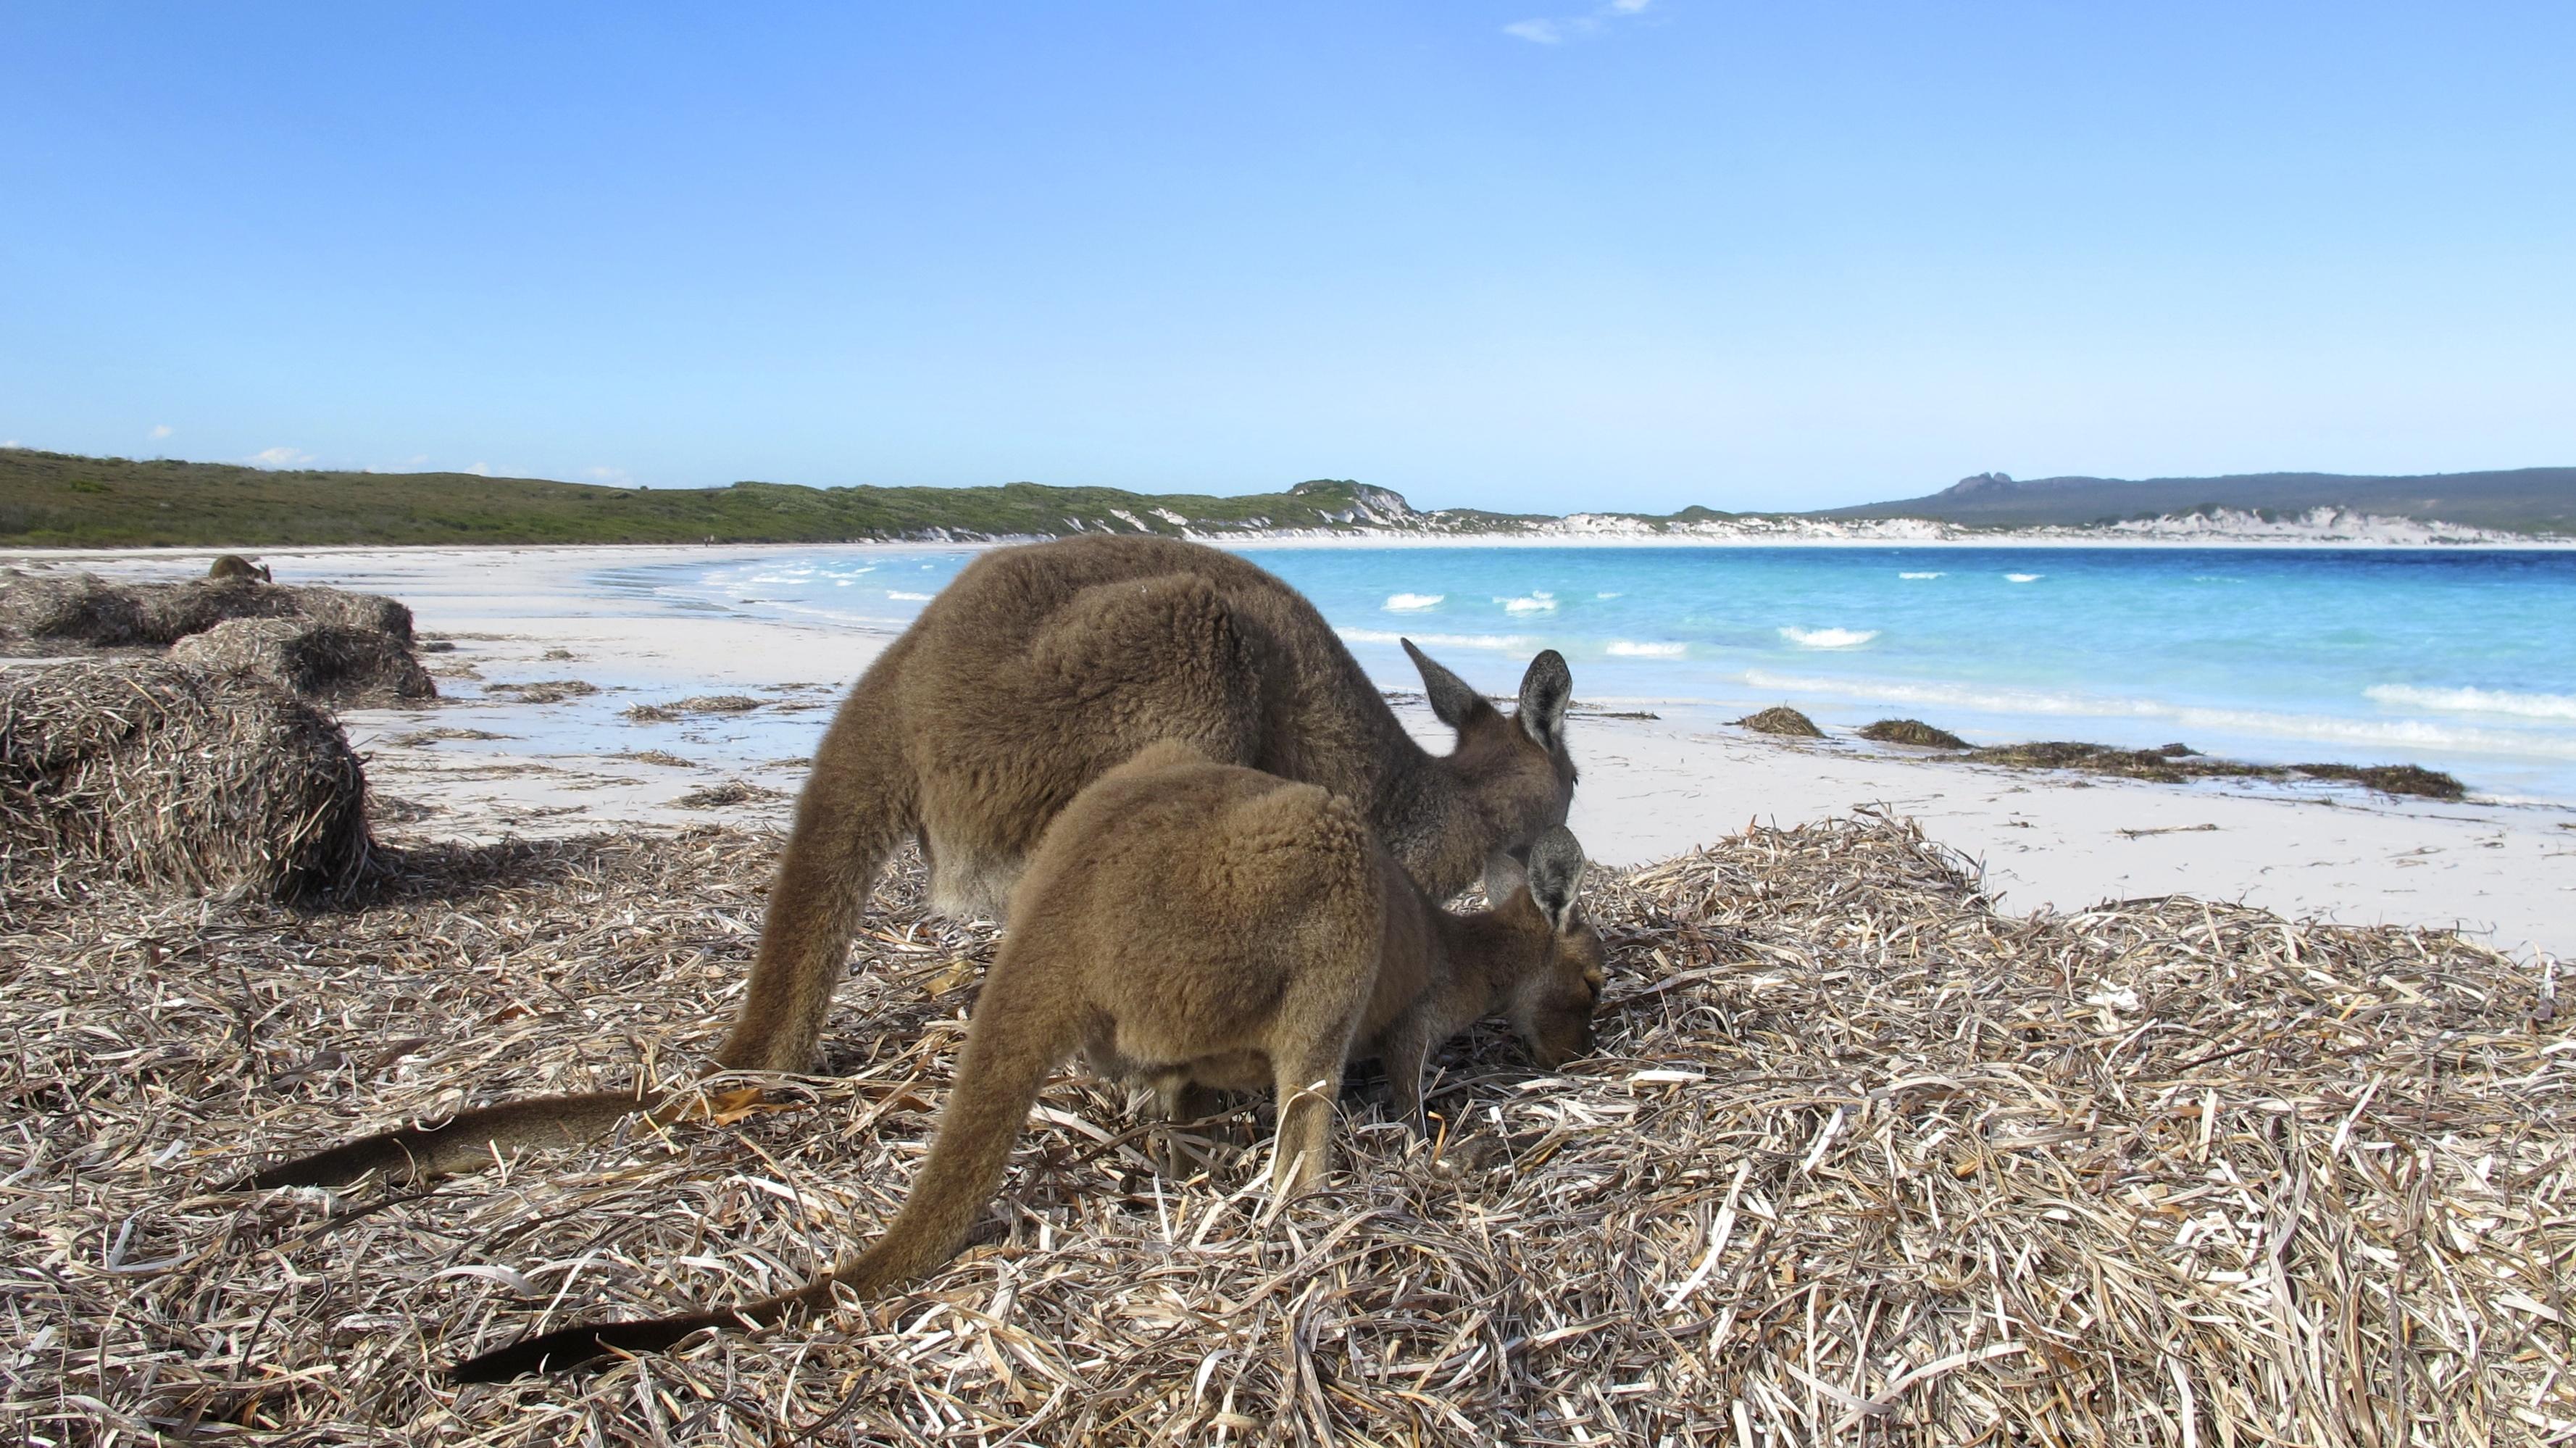 Kangaroo Sitting Skipping Outback Australia